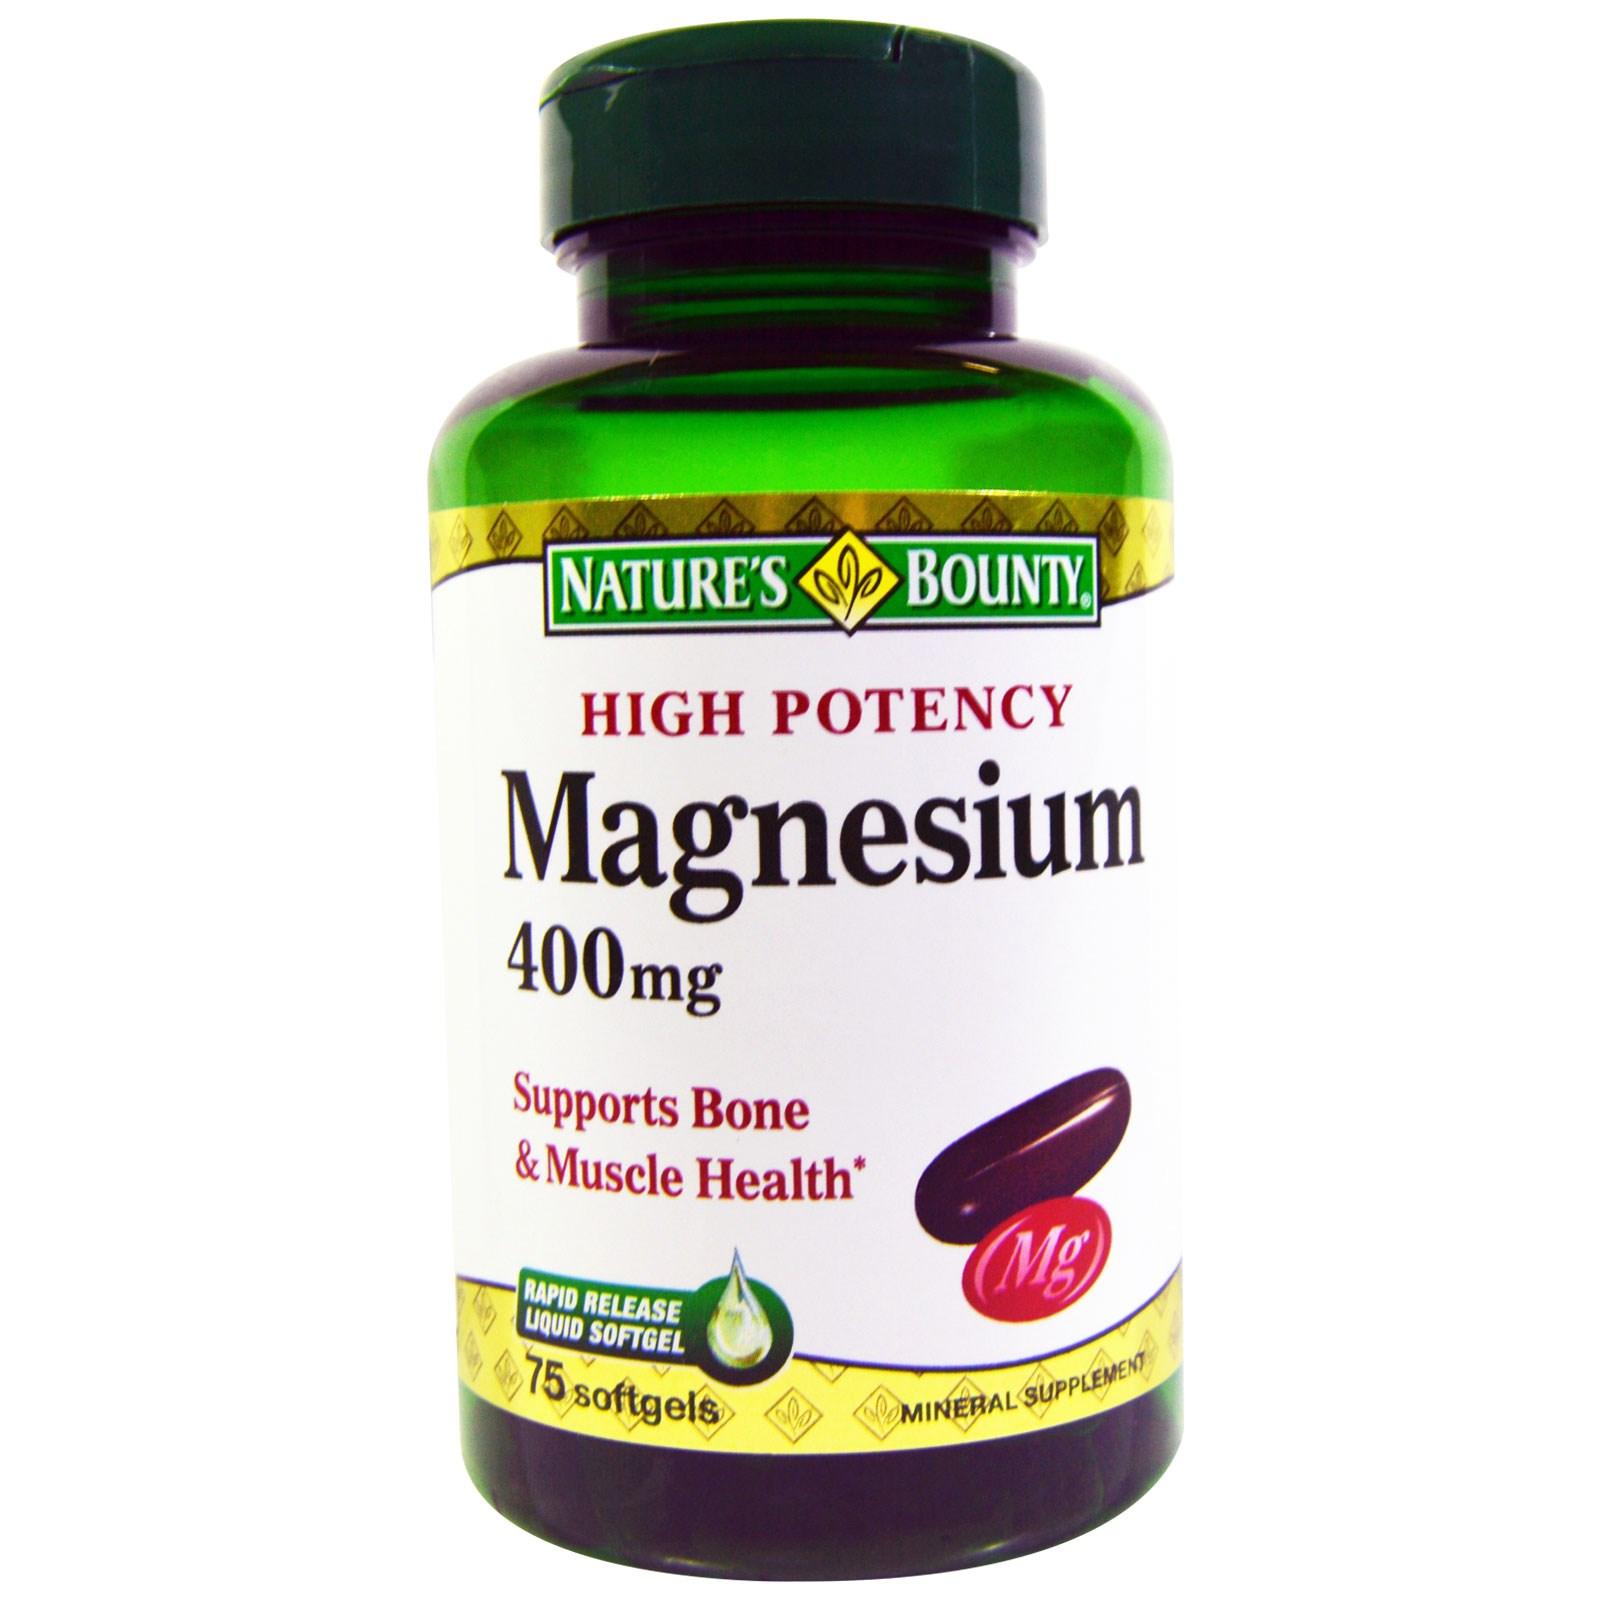 bounty magnesium nature mg 400 softgels iherb natures evitamins tablets